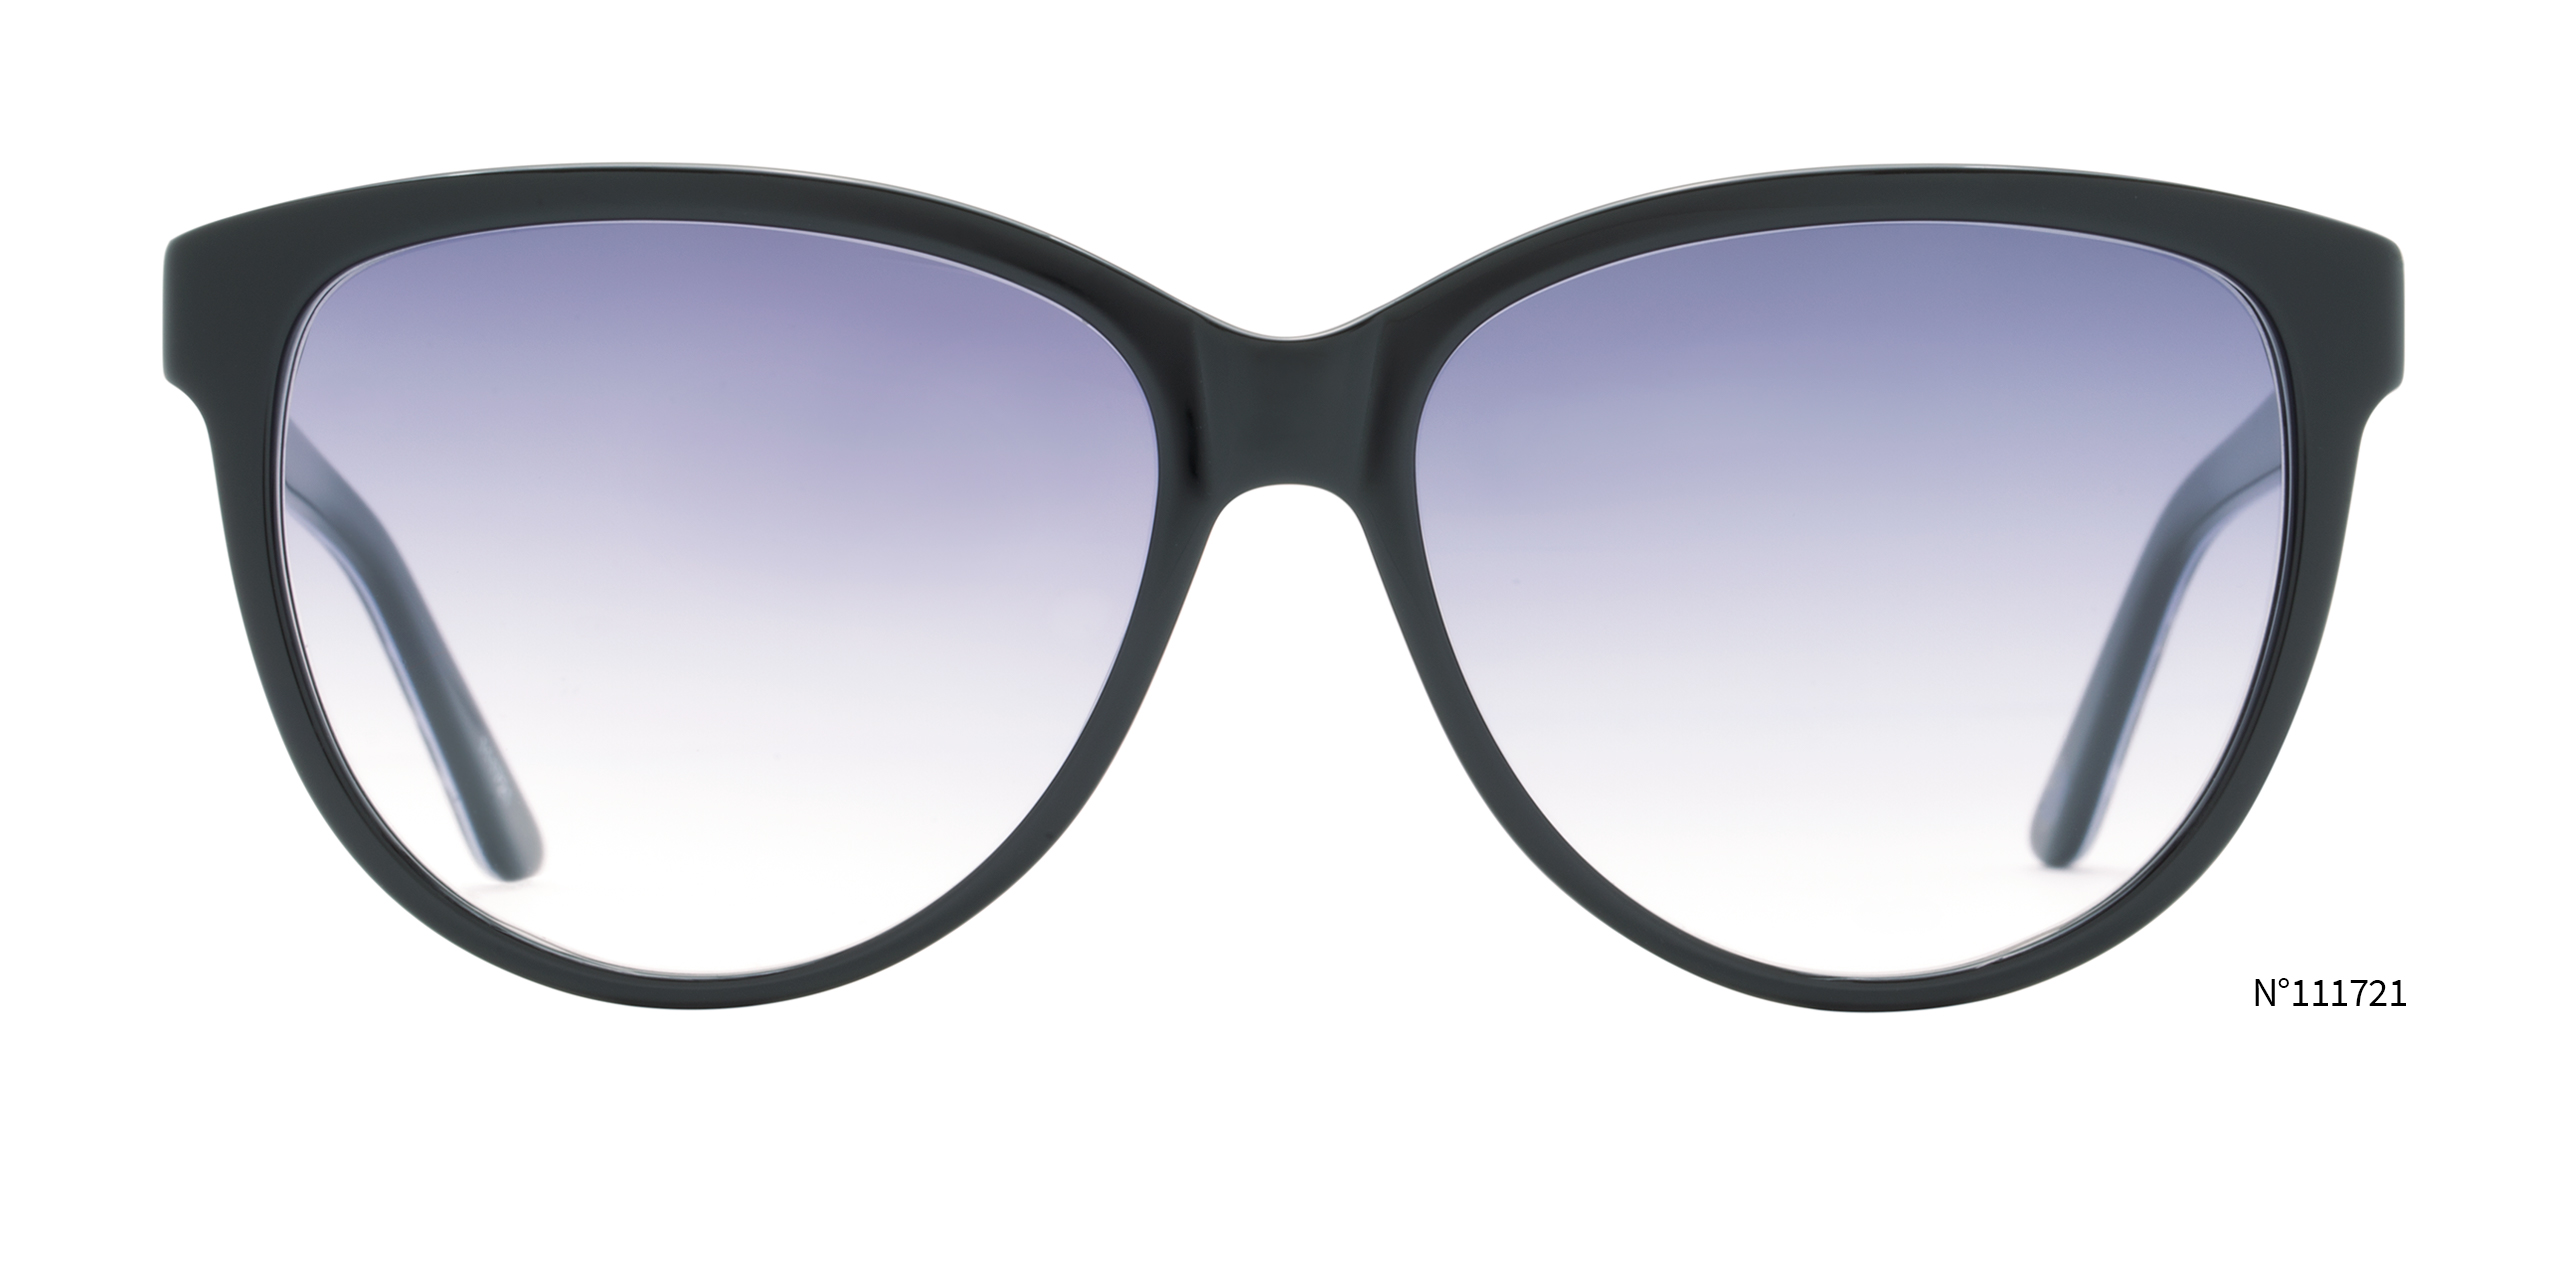 glastonbury-festival glasses